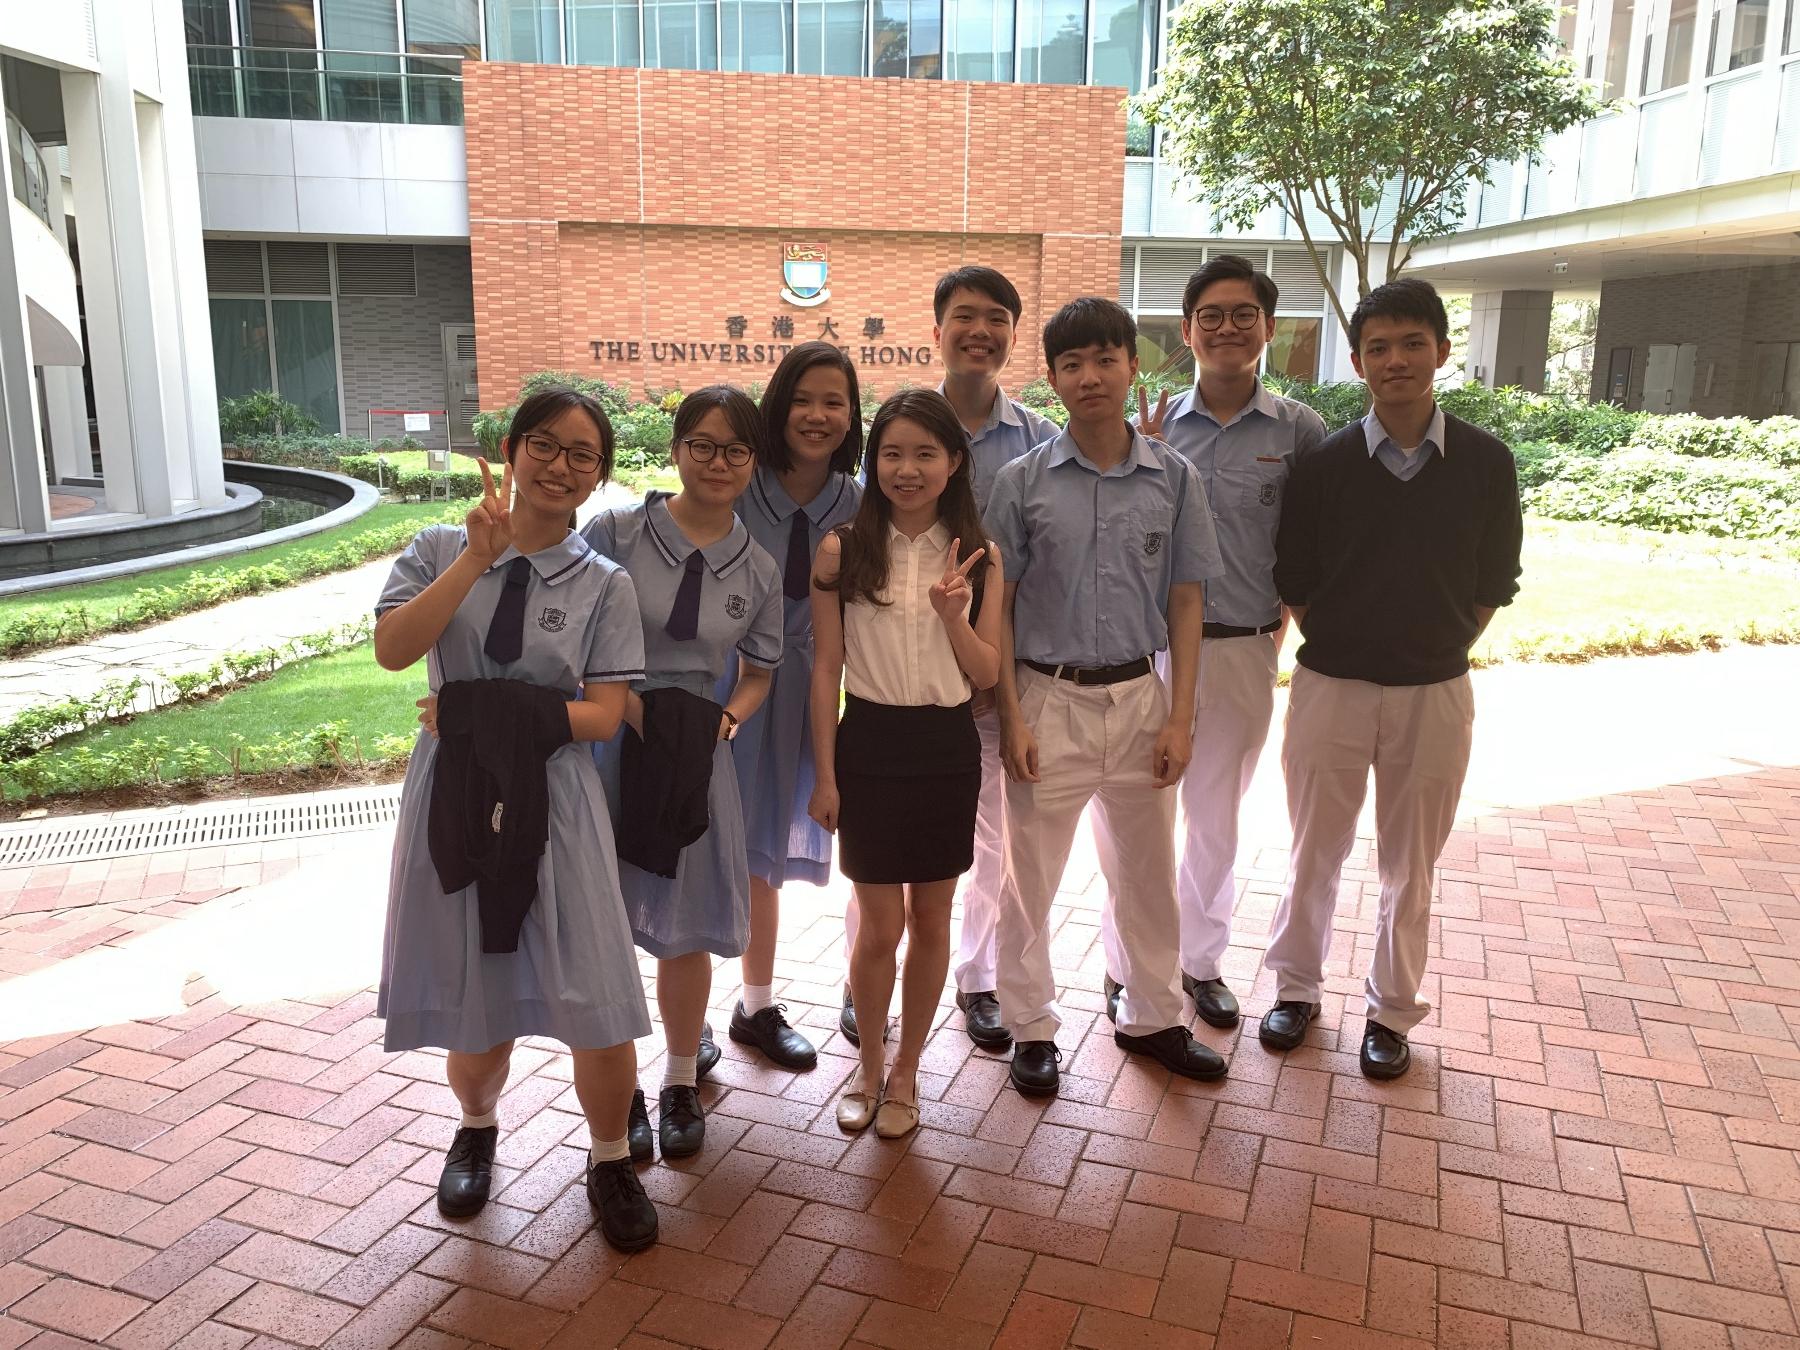 http://npc.edu.hk/sites/default/files/img_2861_1.jpg